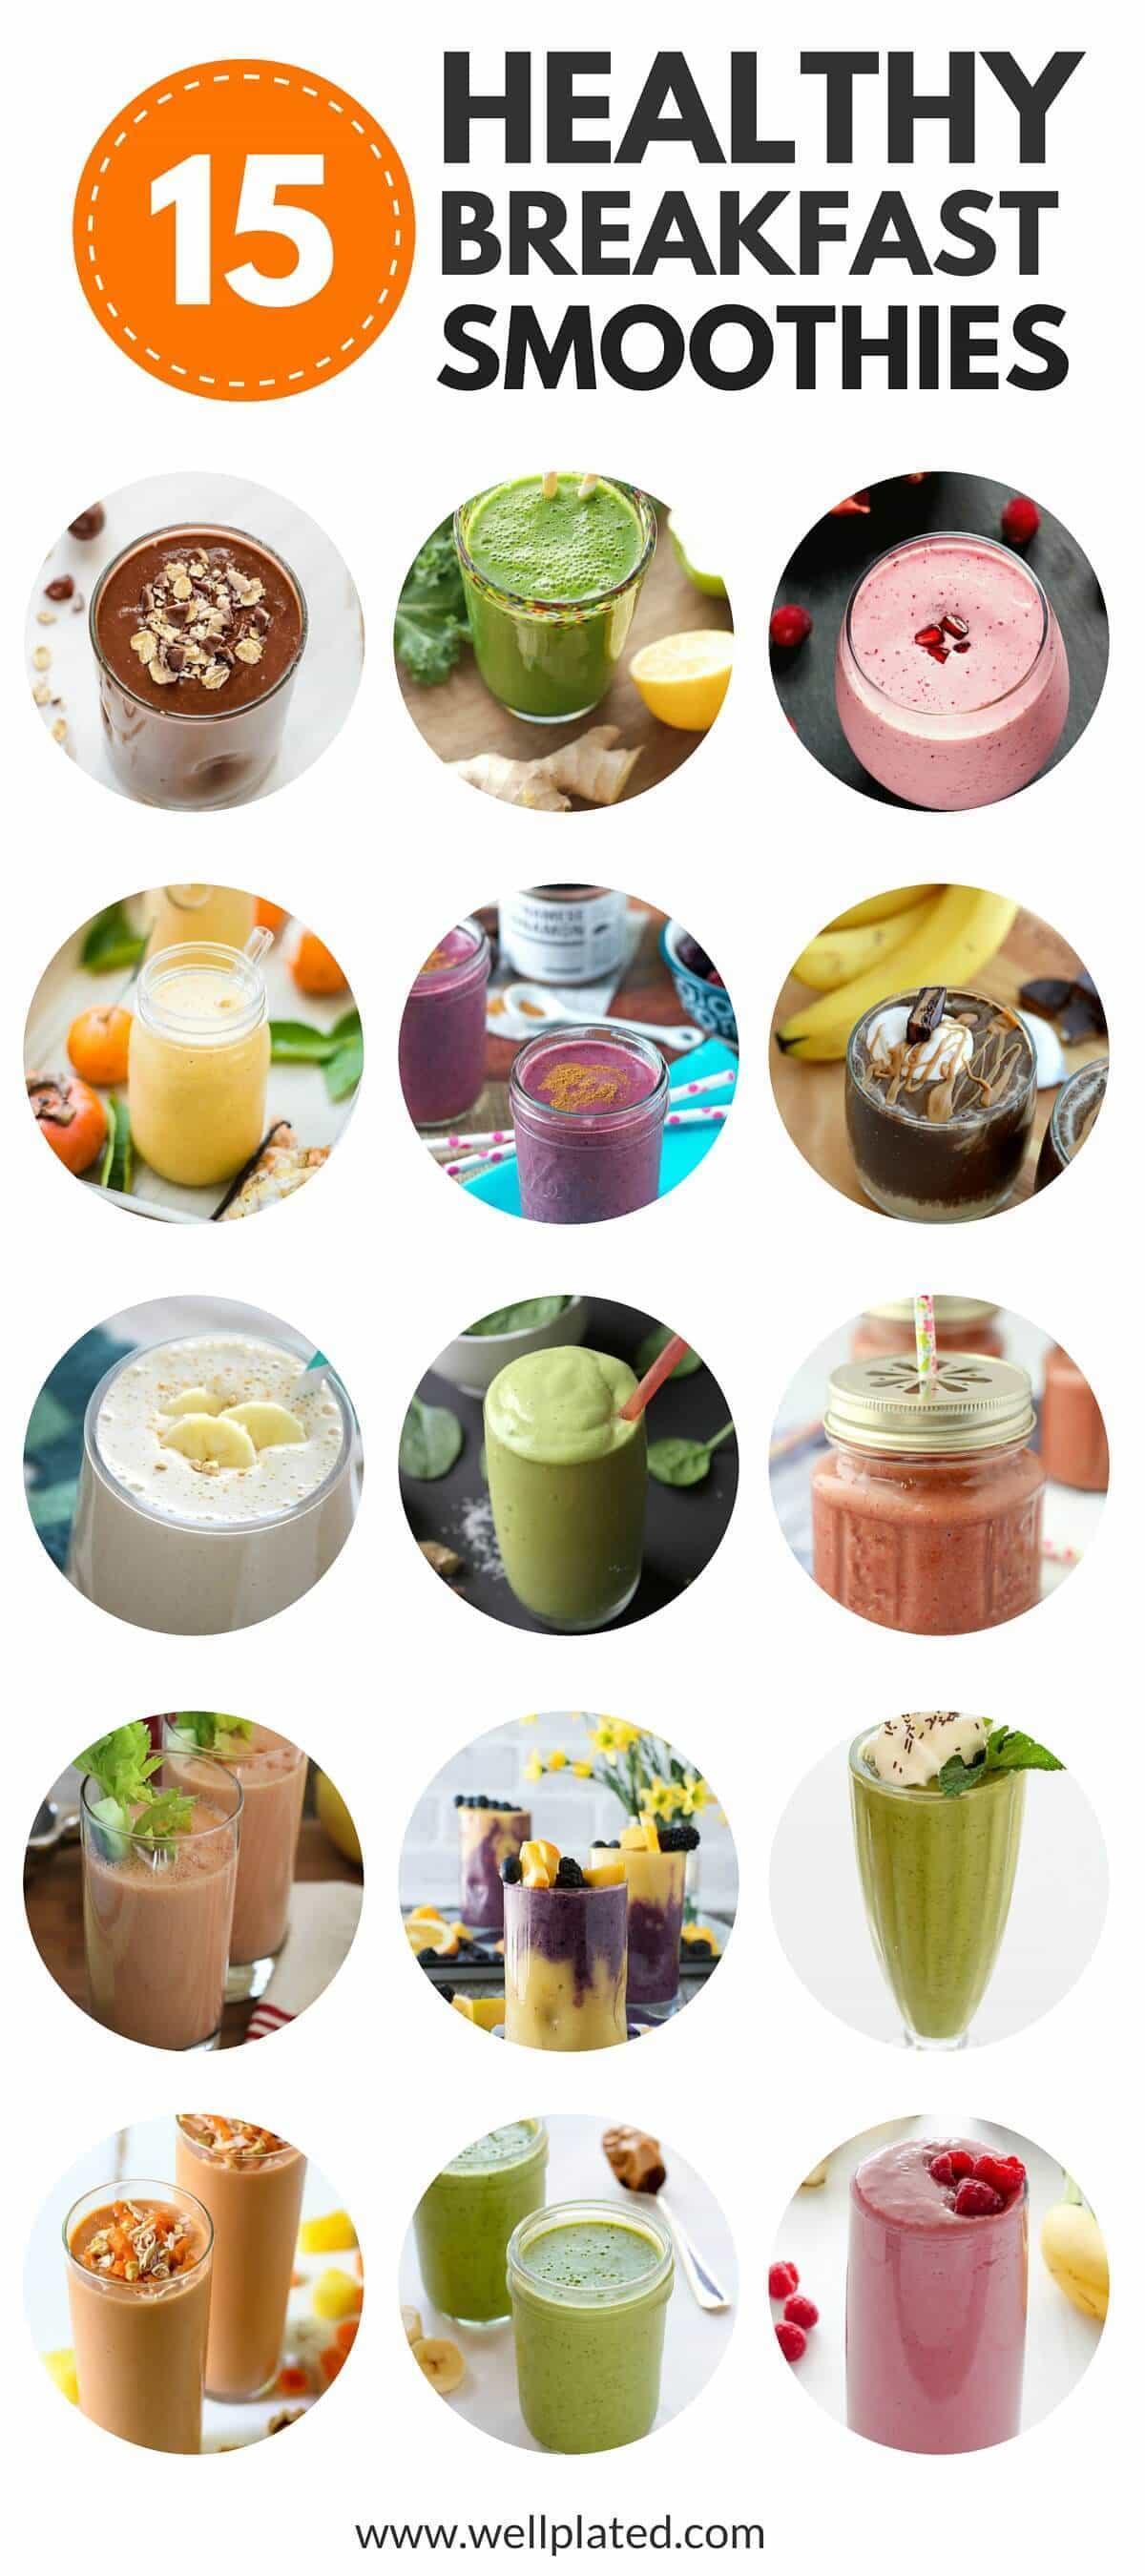 Healthy Diet Breakfast Recipes  The Best 15 Healthy Breakfast Smoothies